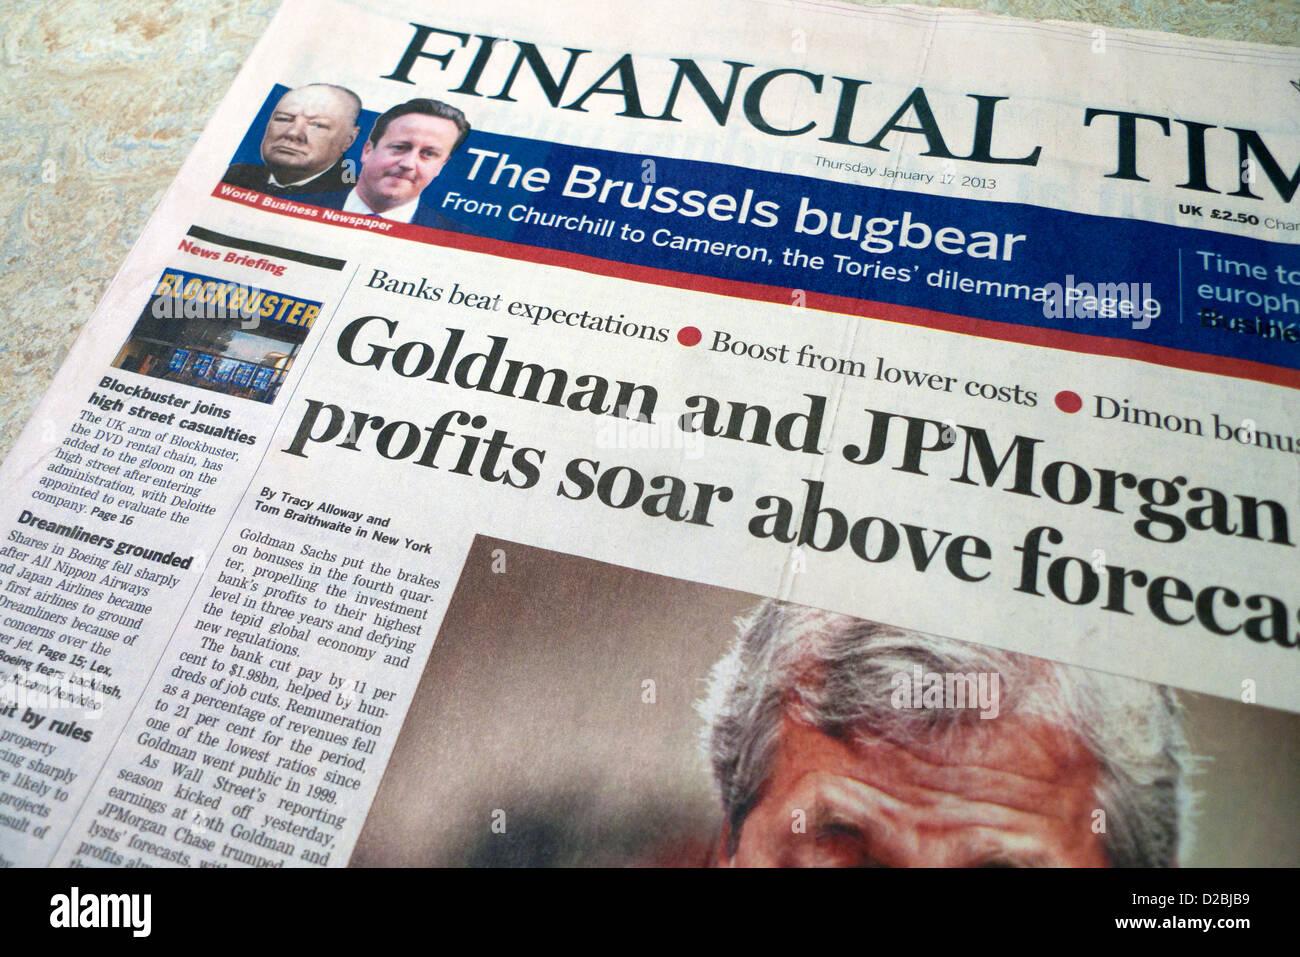 Financial Times newspaper headlines Goldman Sachs et JP Morgan 'Profits  Soar' London England UK Photo Stock - Alamy